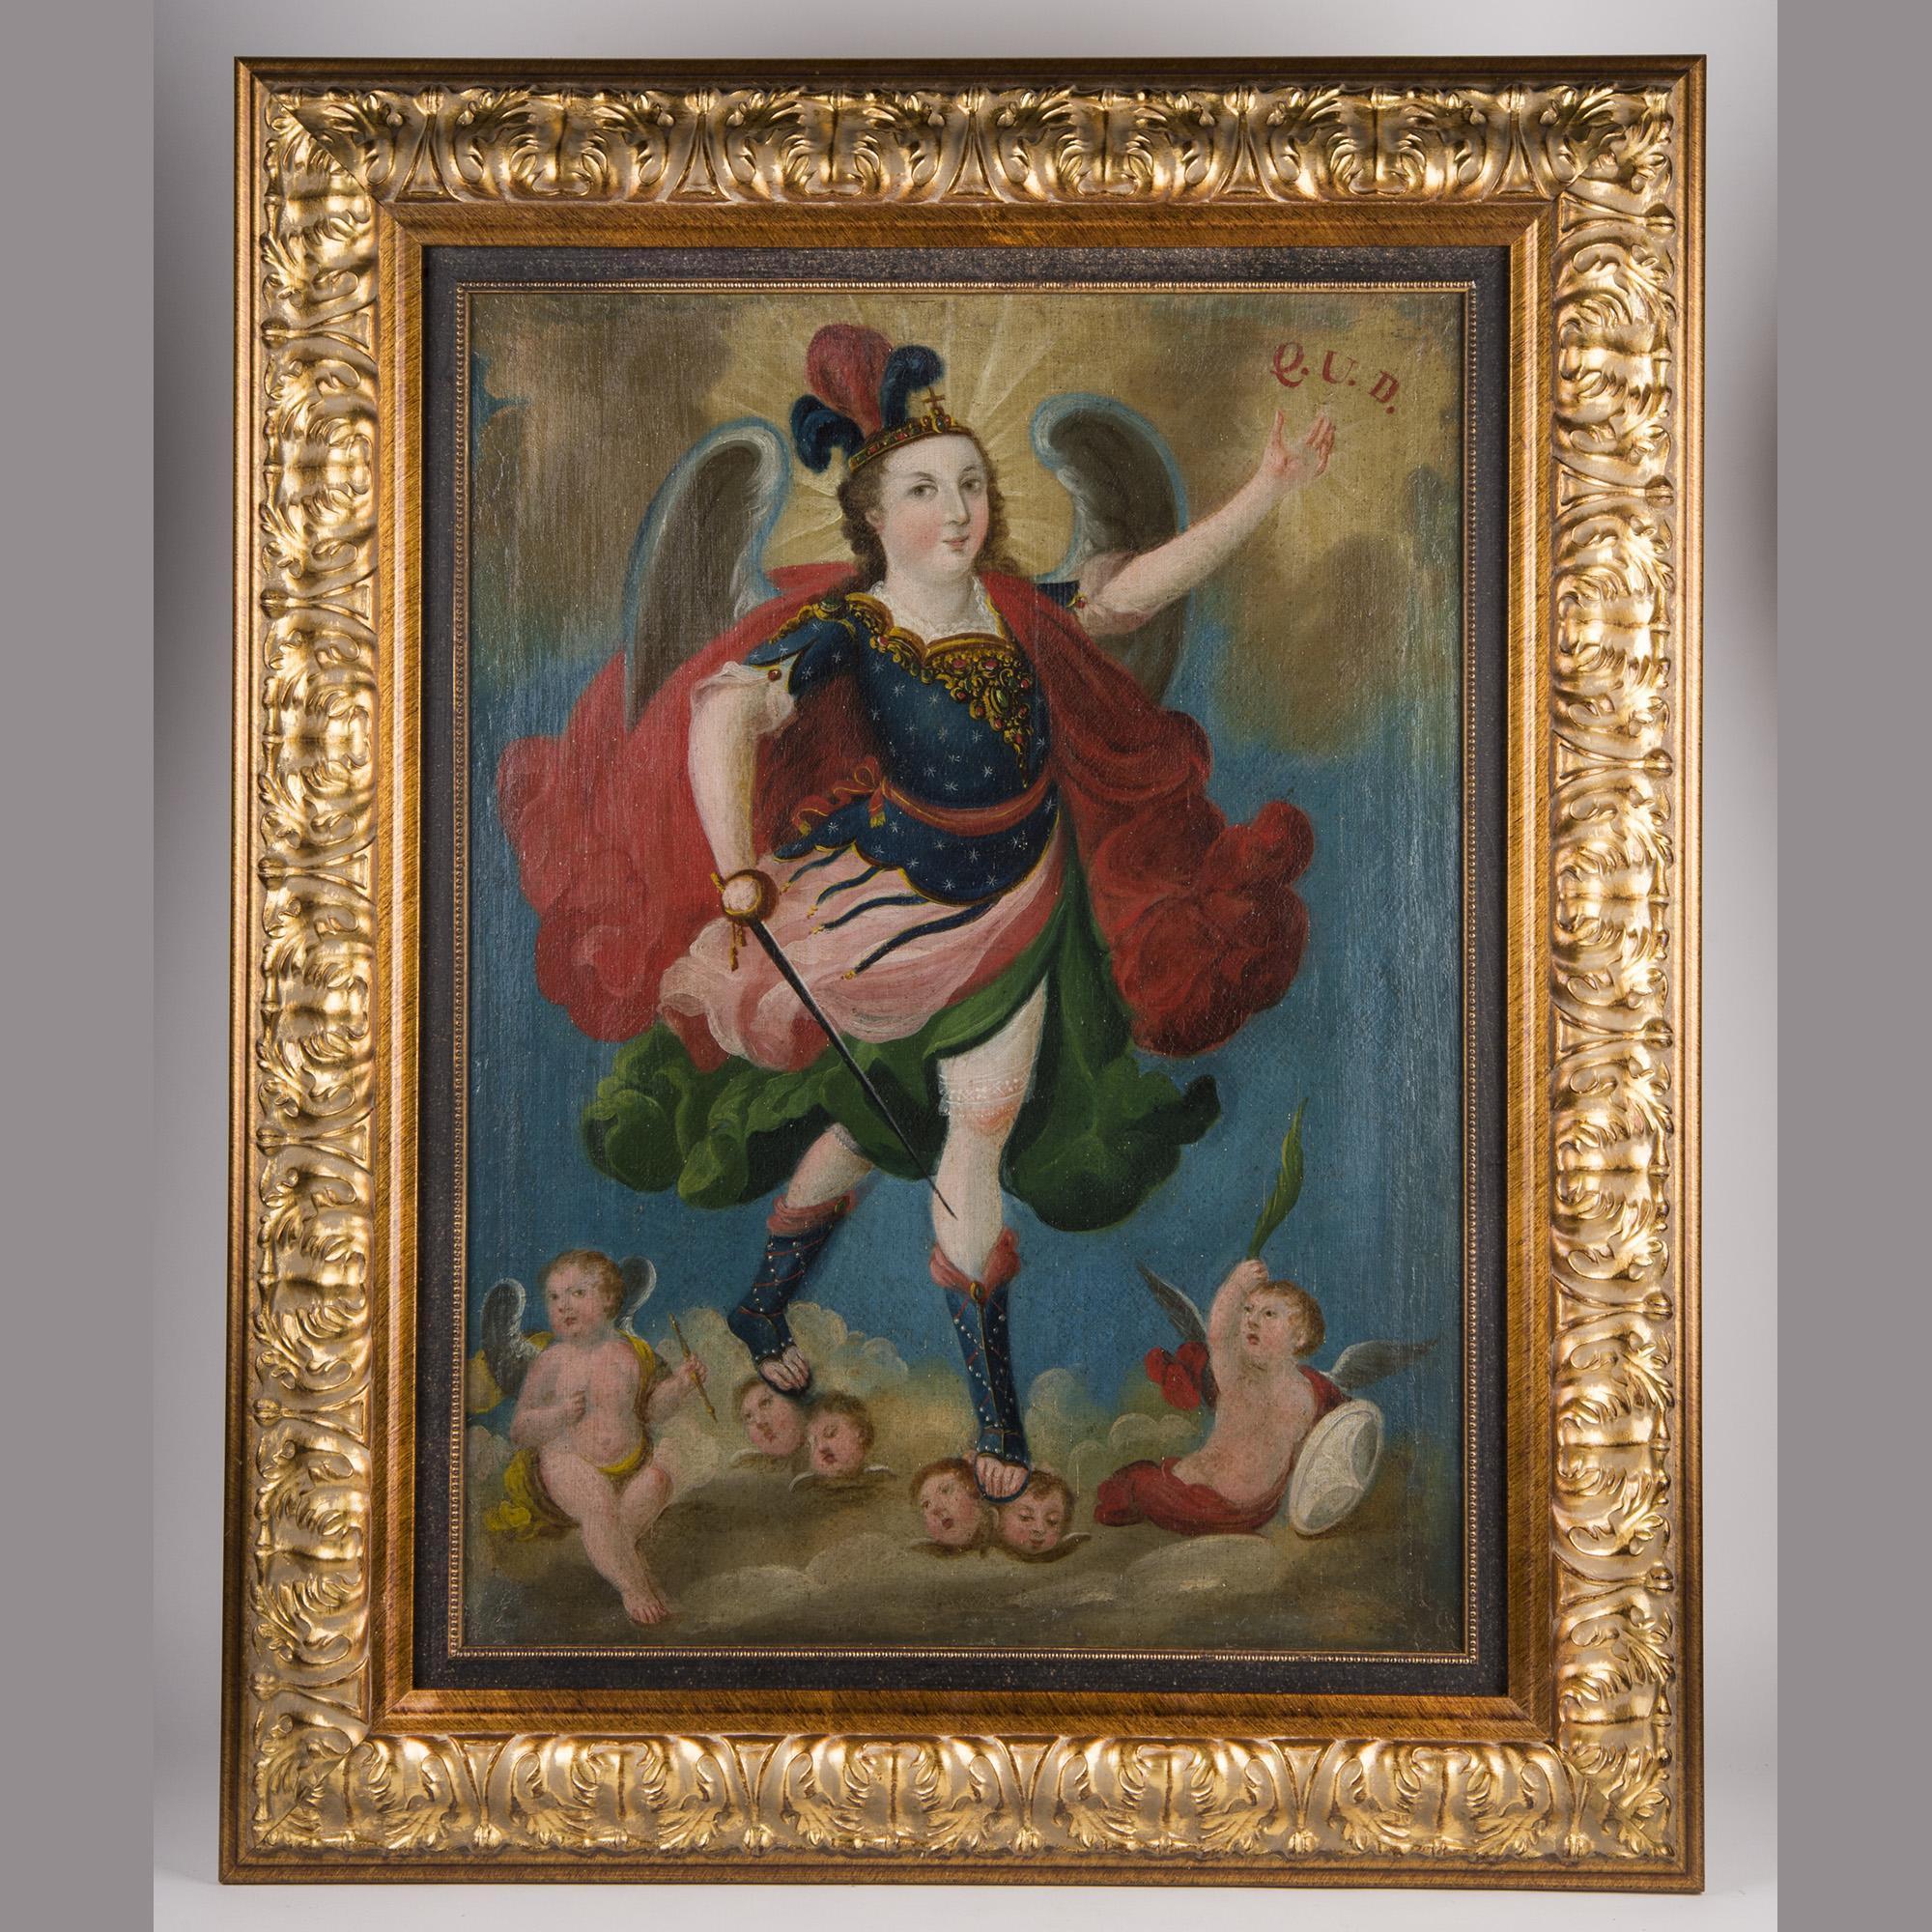 Cuzco School Painting For Sale